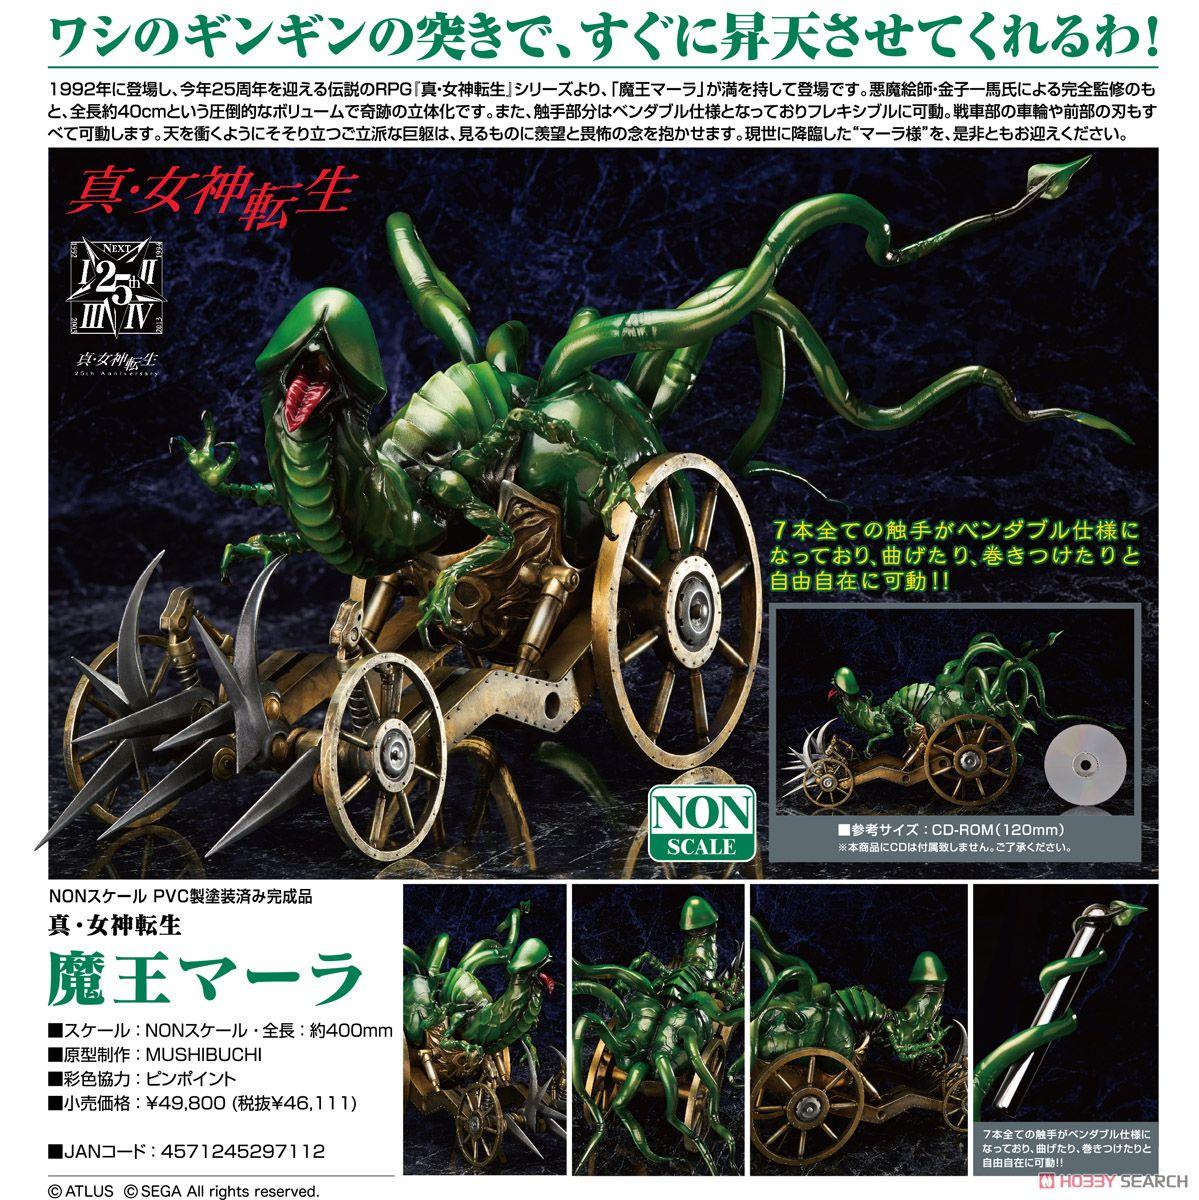 Megami Tensei - Demon Lord Mara